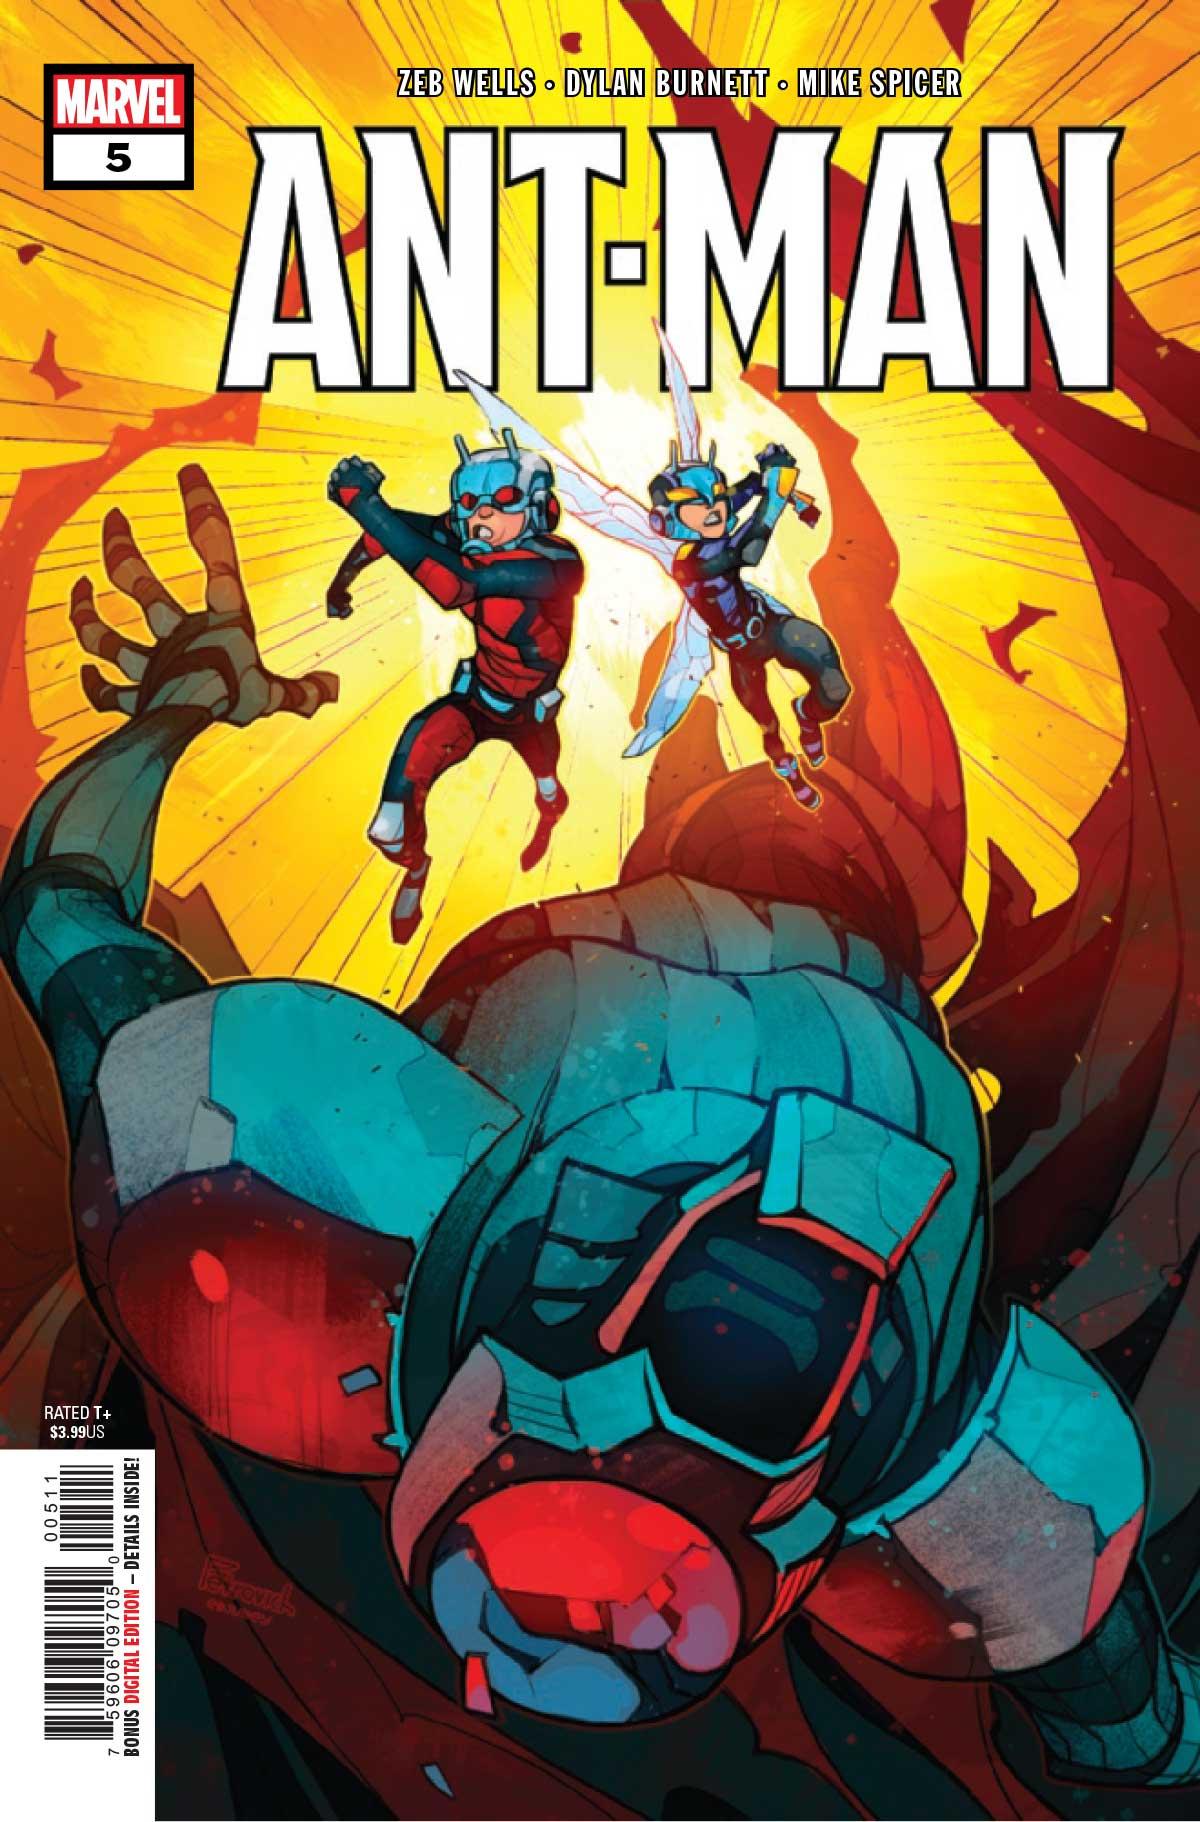 Ant-Man #5